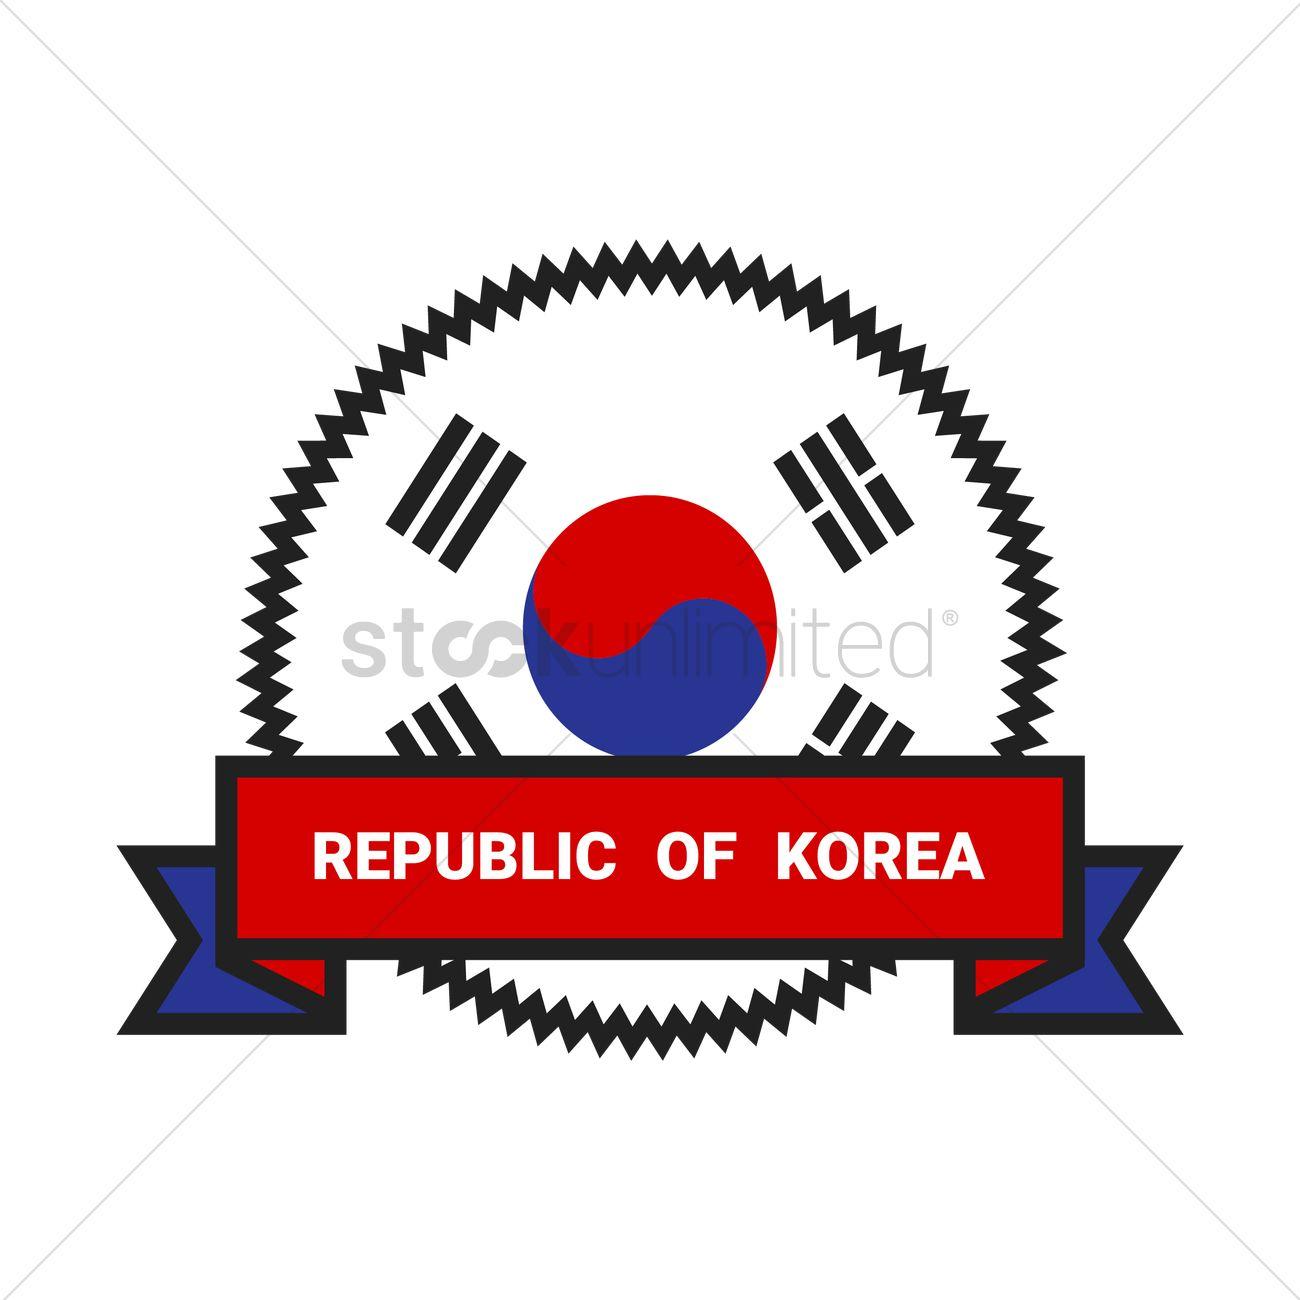 Republic of korea Vector Image.